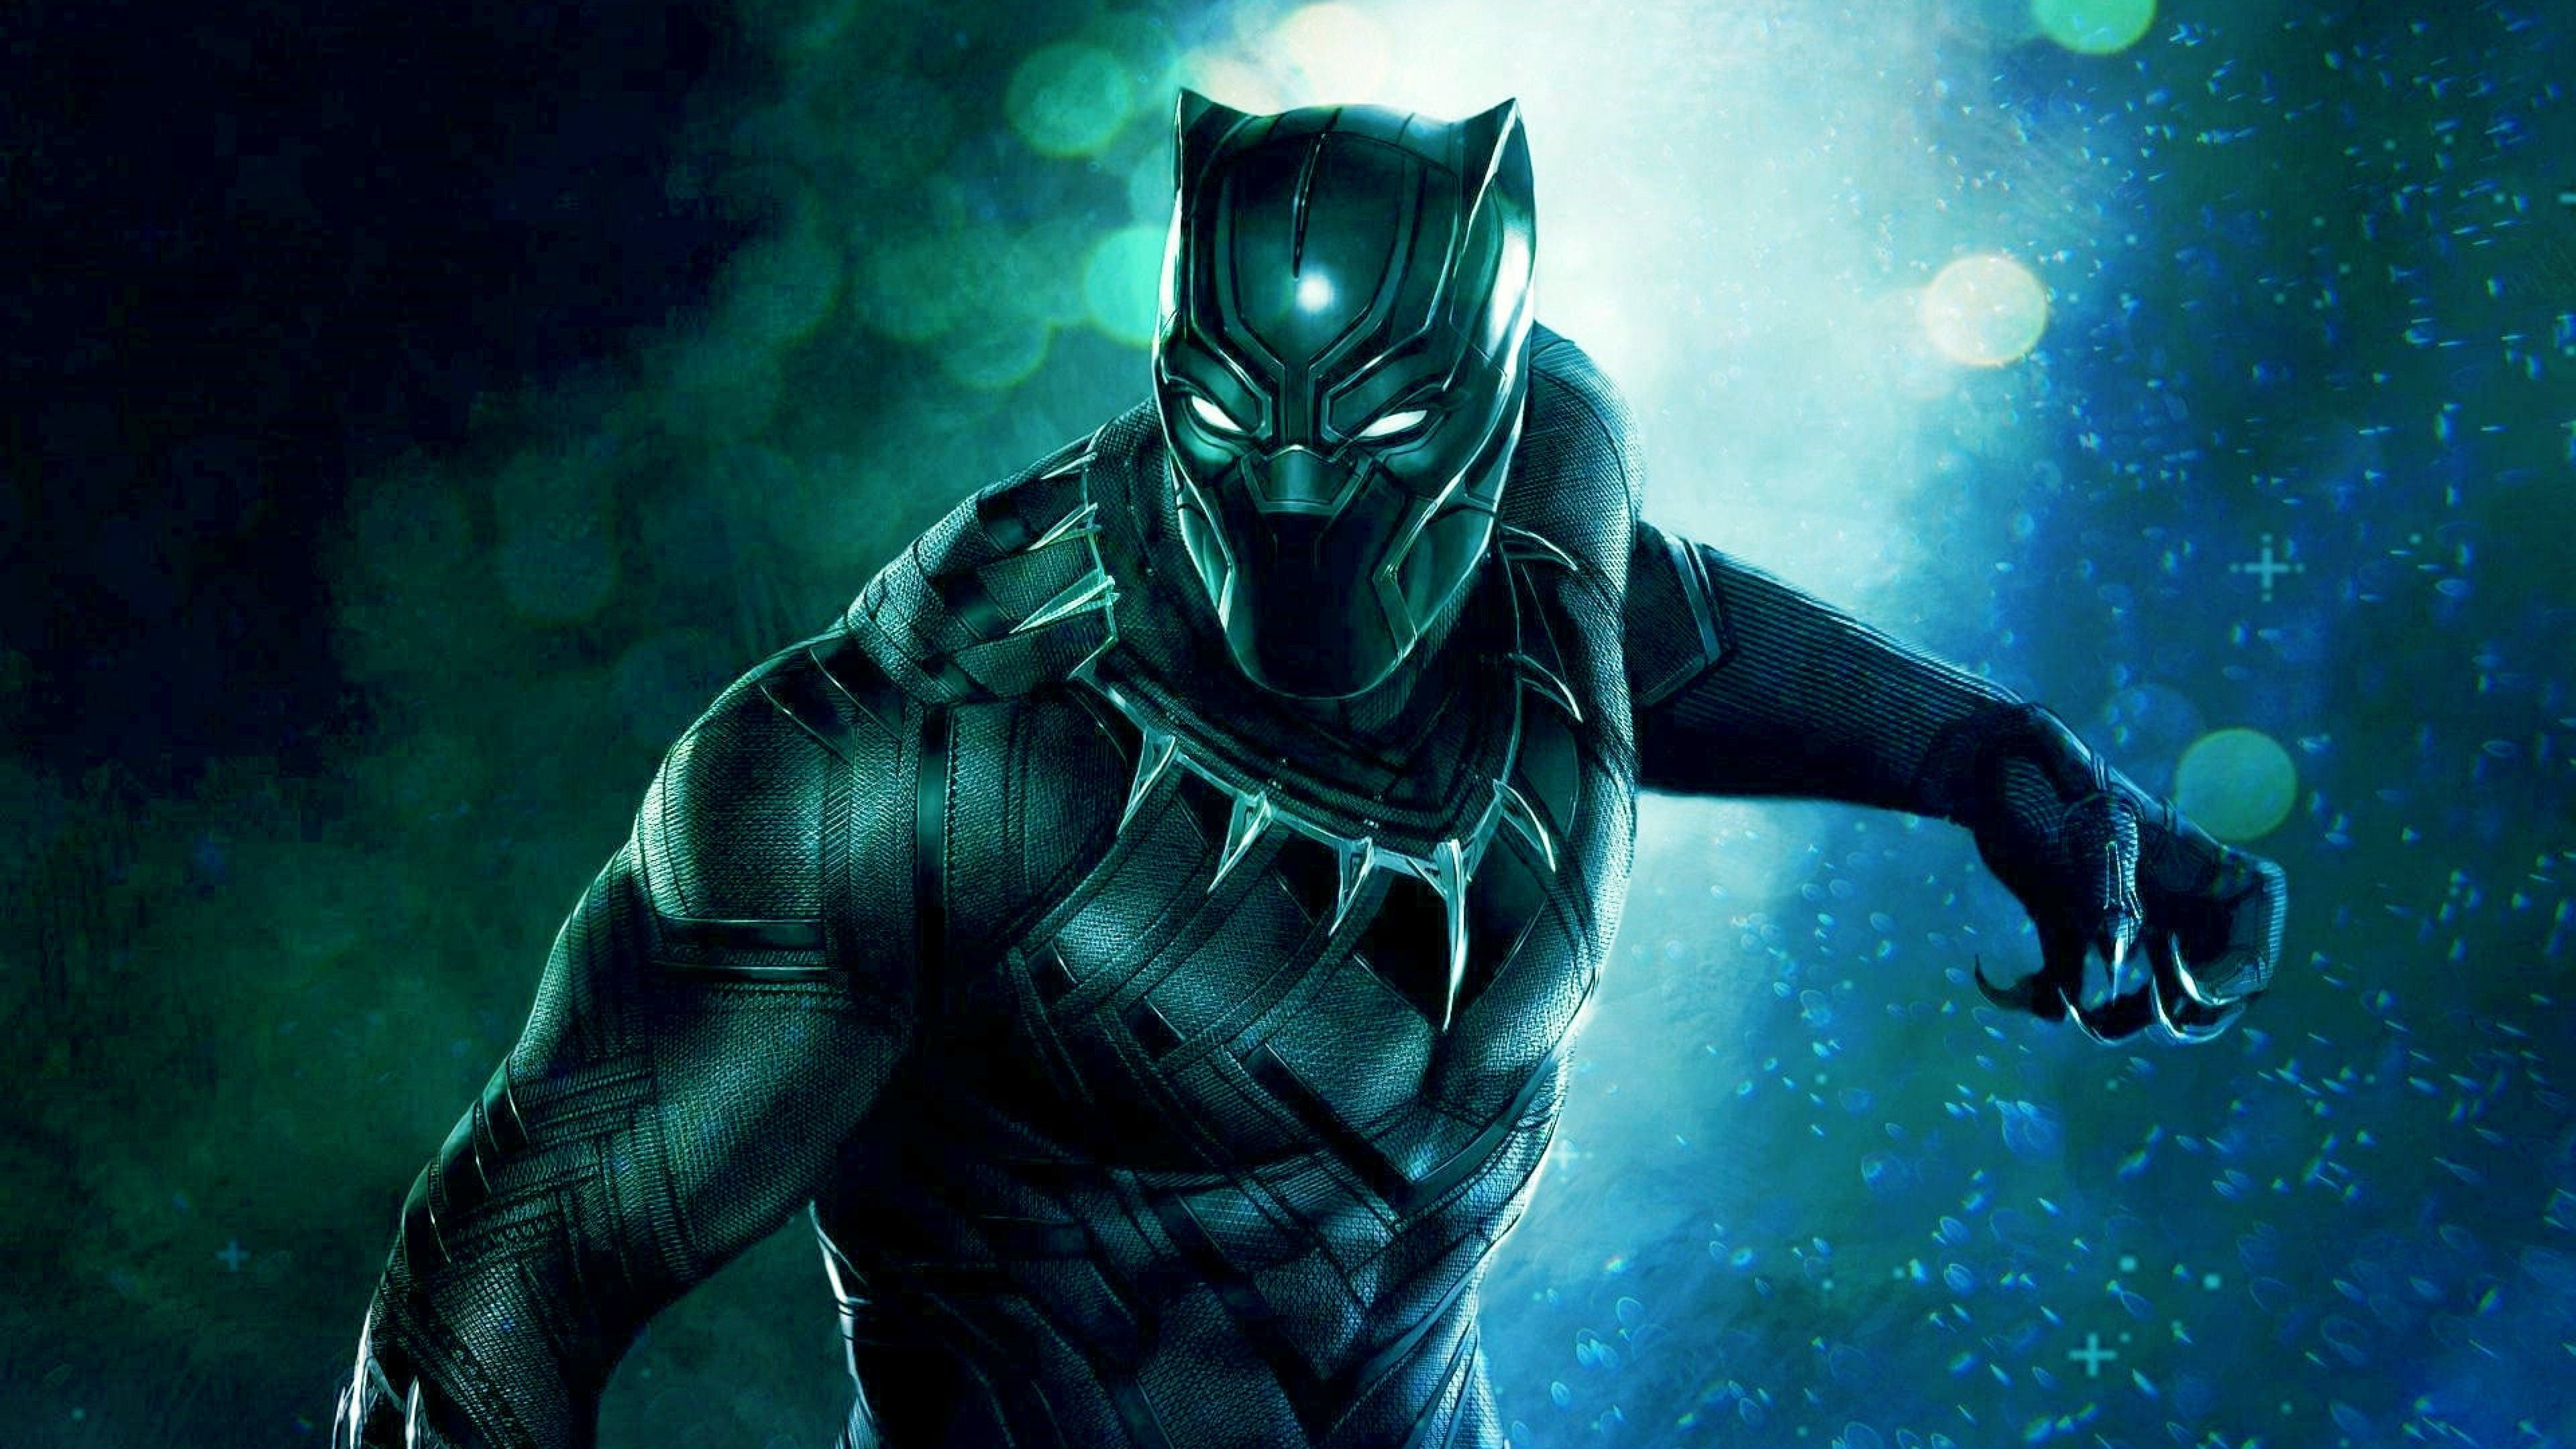 Black Panther Vector Art 4k Superheroes Wallpapers Hd Wallpapers Black Panther Wallpapers Behance Wallpapers Artwork Wallp Black Panther Vector Art Panther